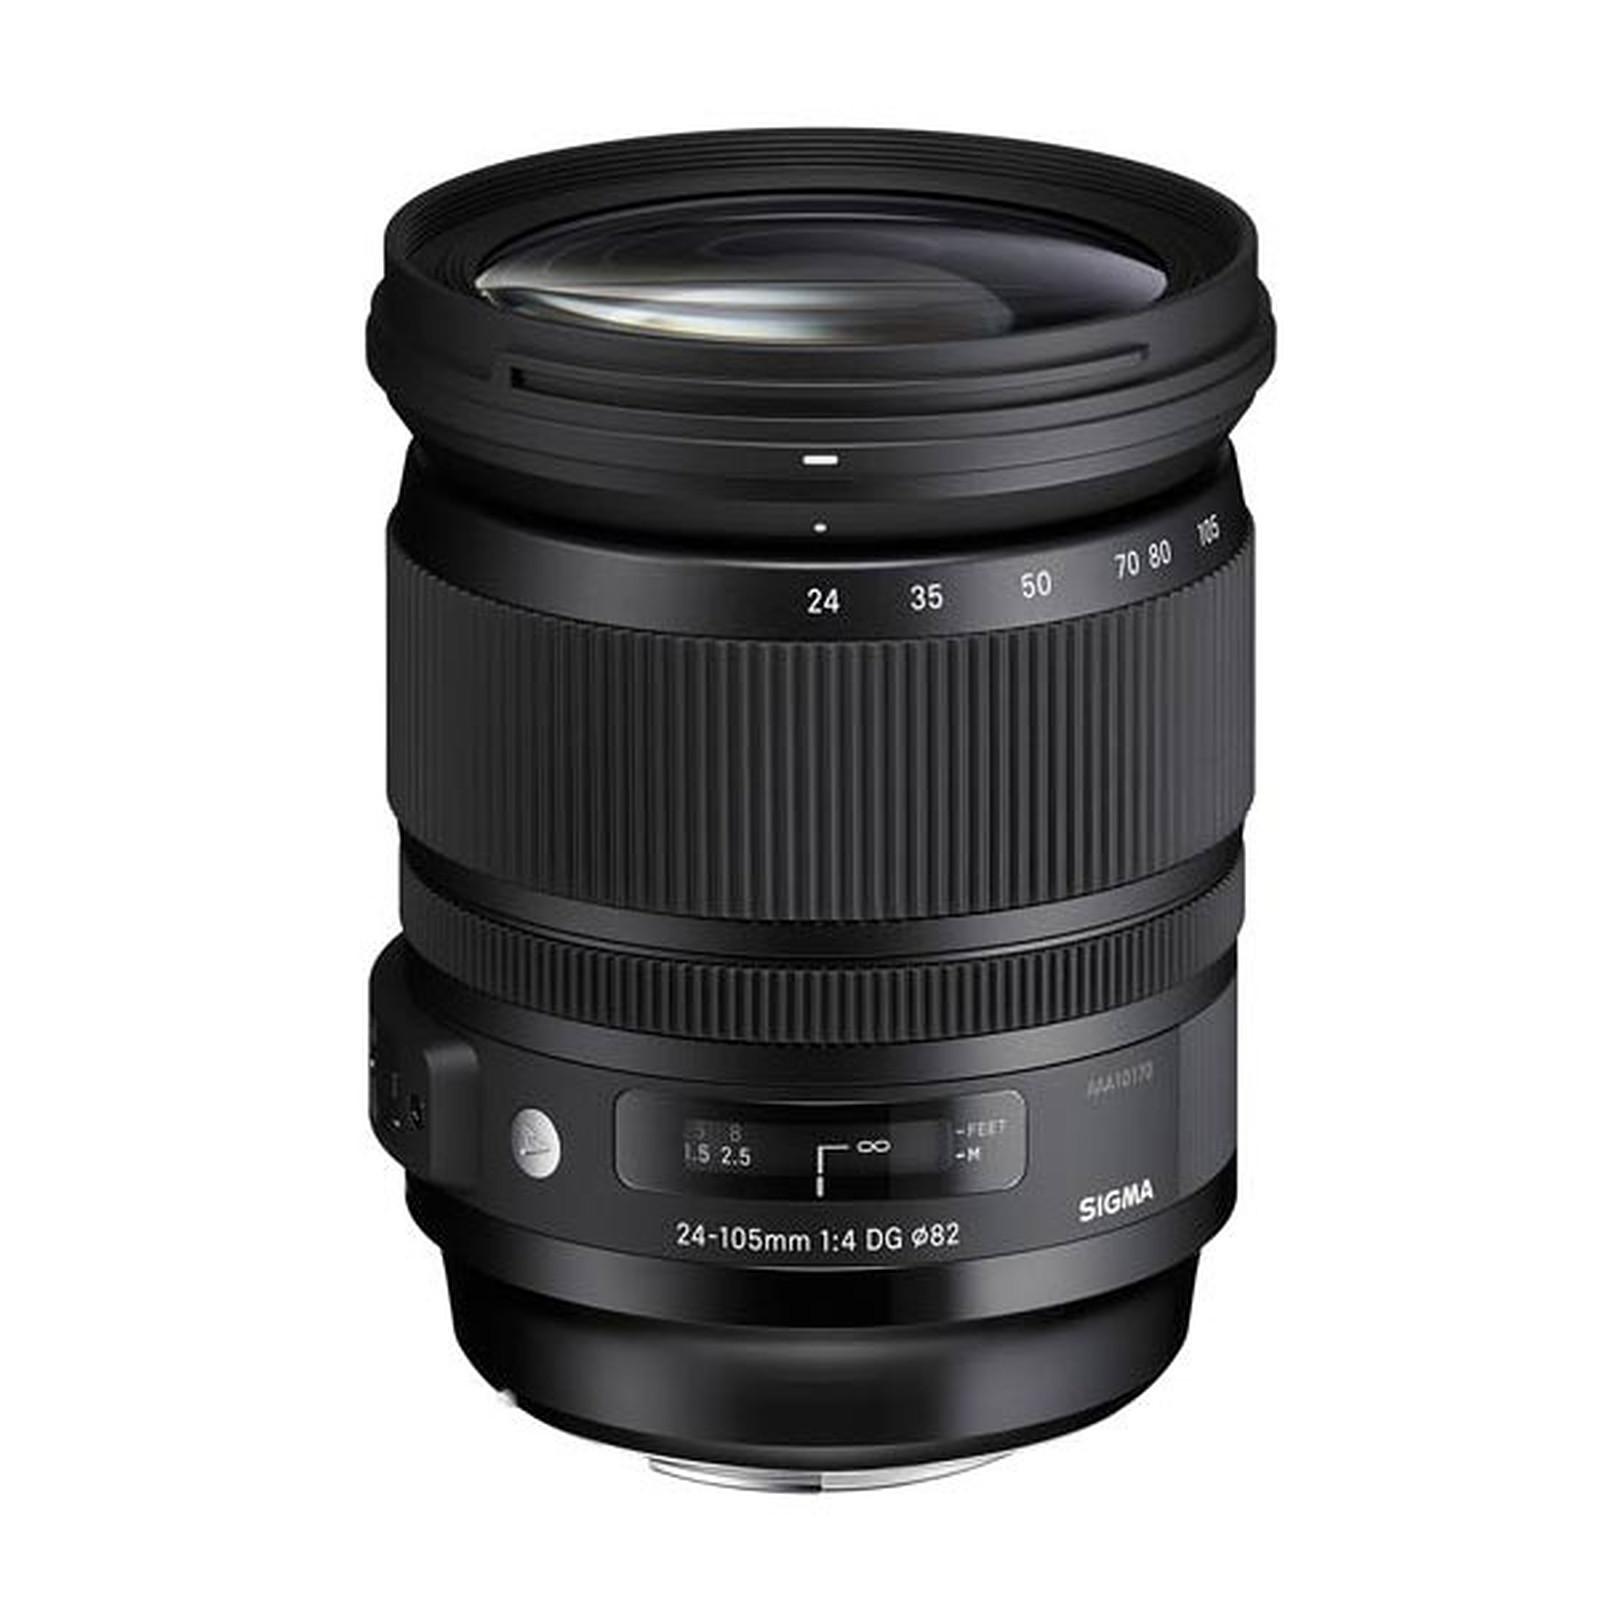 SIGMA 24-105 mm F4 DG OS HSM monture Canon